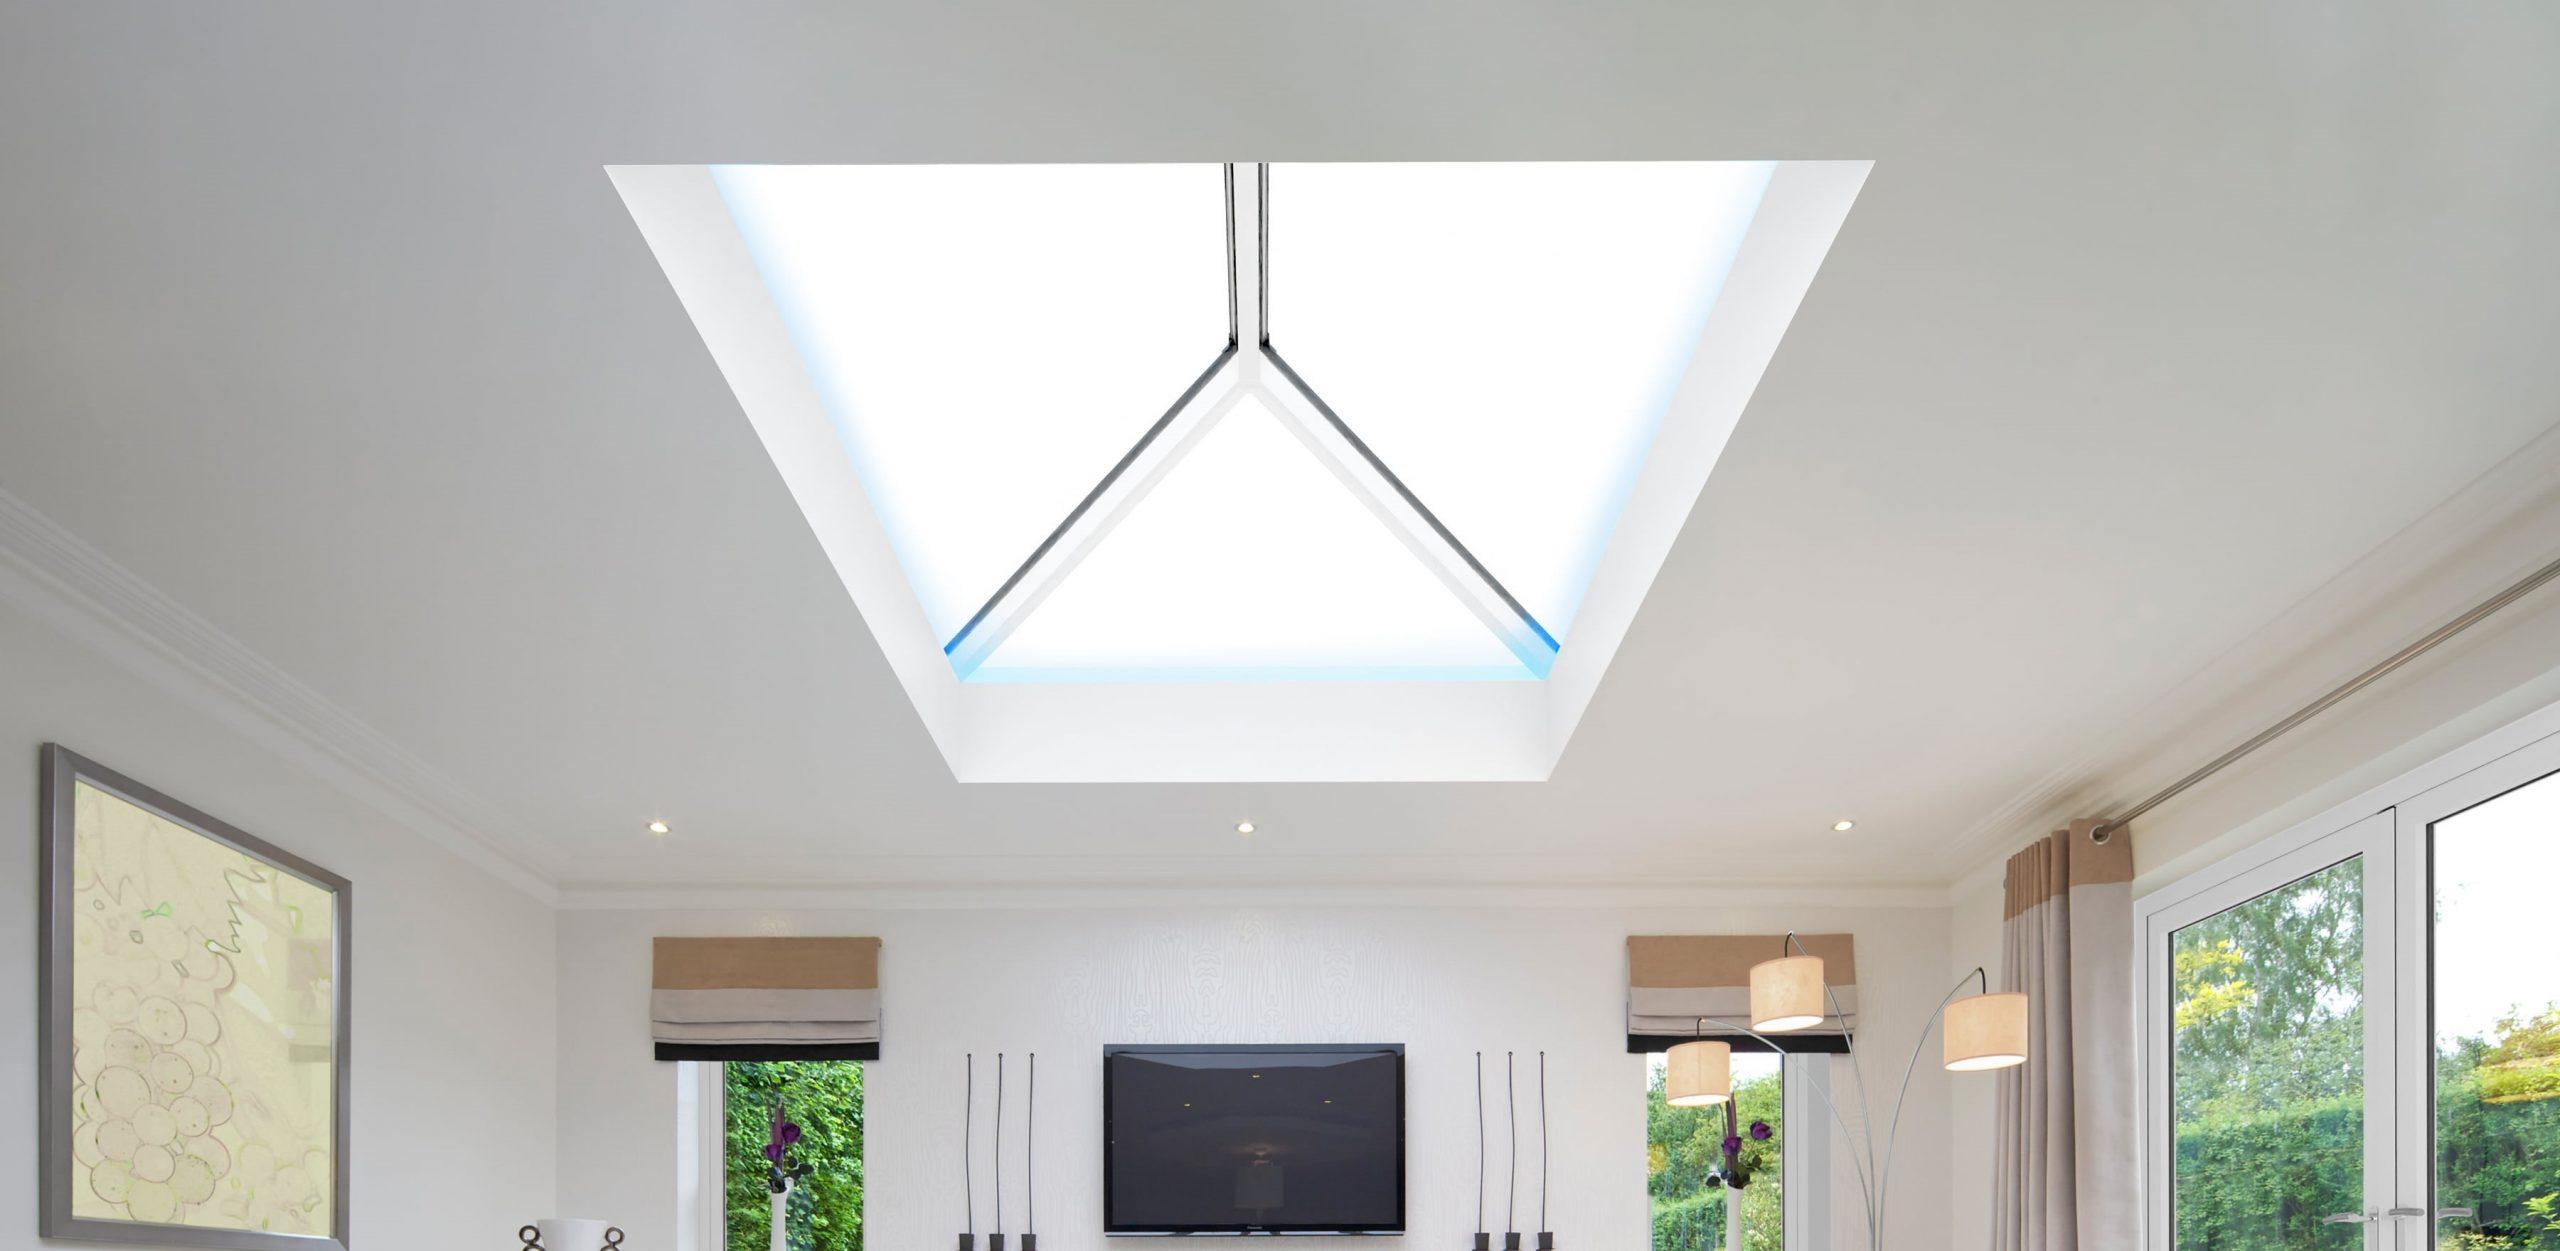 https://www.gardenofeden.co.uk/wp-content/uploads/2021/07/S1-Lantern-Lounge-with-LEDs-min-2-scaled.jpg